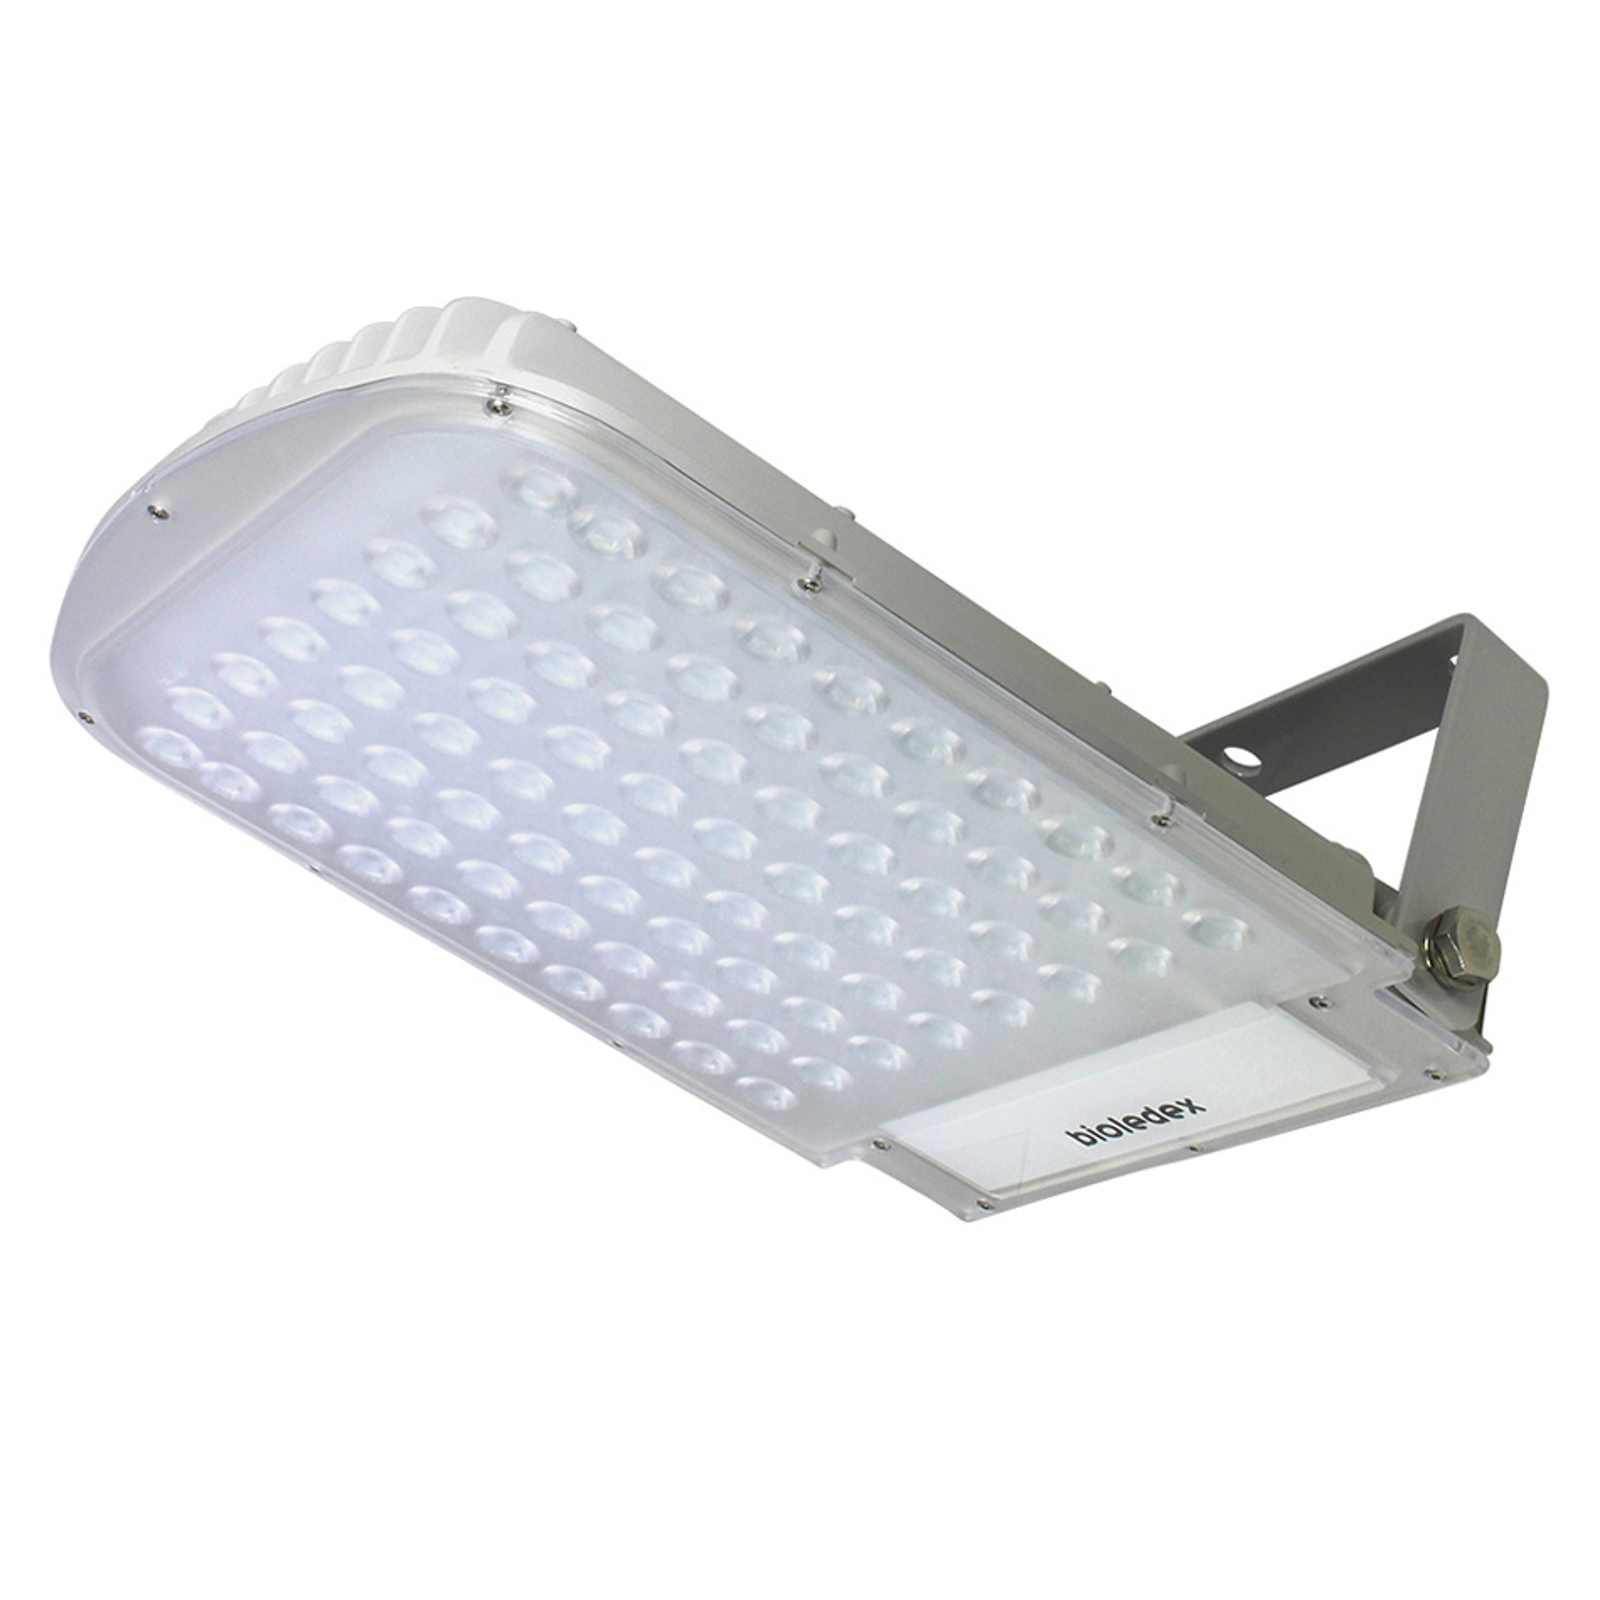 LED-Strahler Astir 50W warmweiß 3.000K 70°